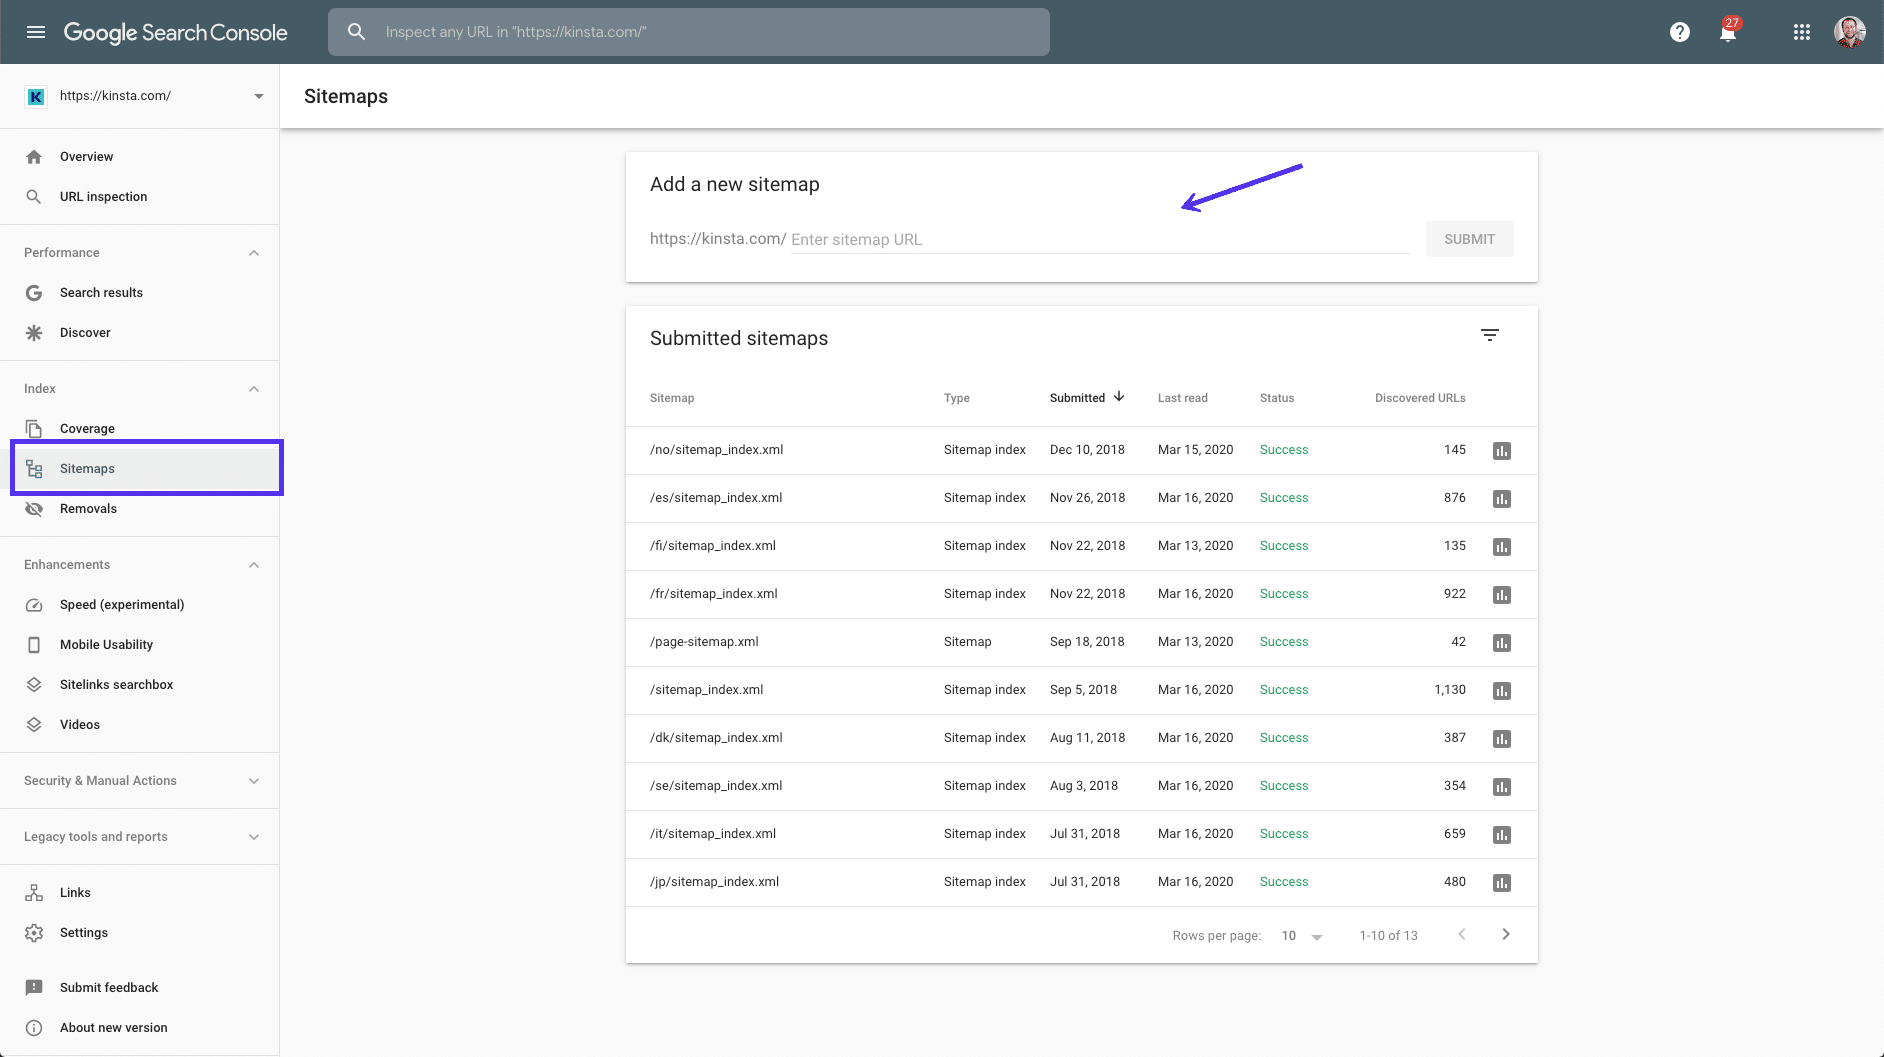 Presentazione di una sitemap a Google Search Console